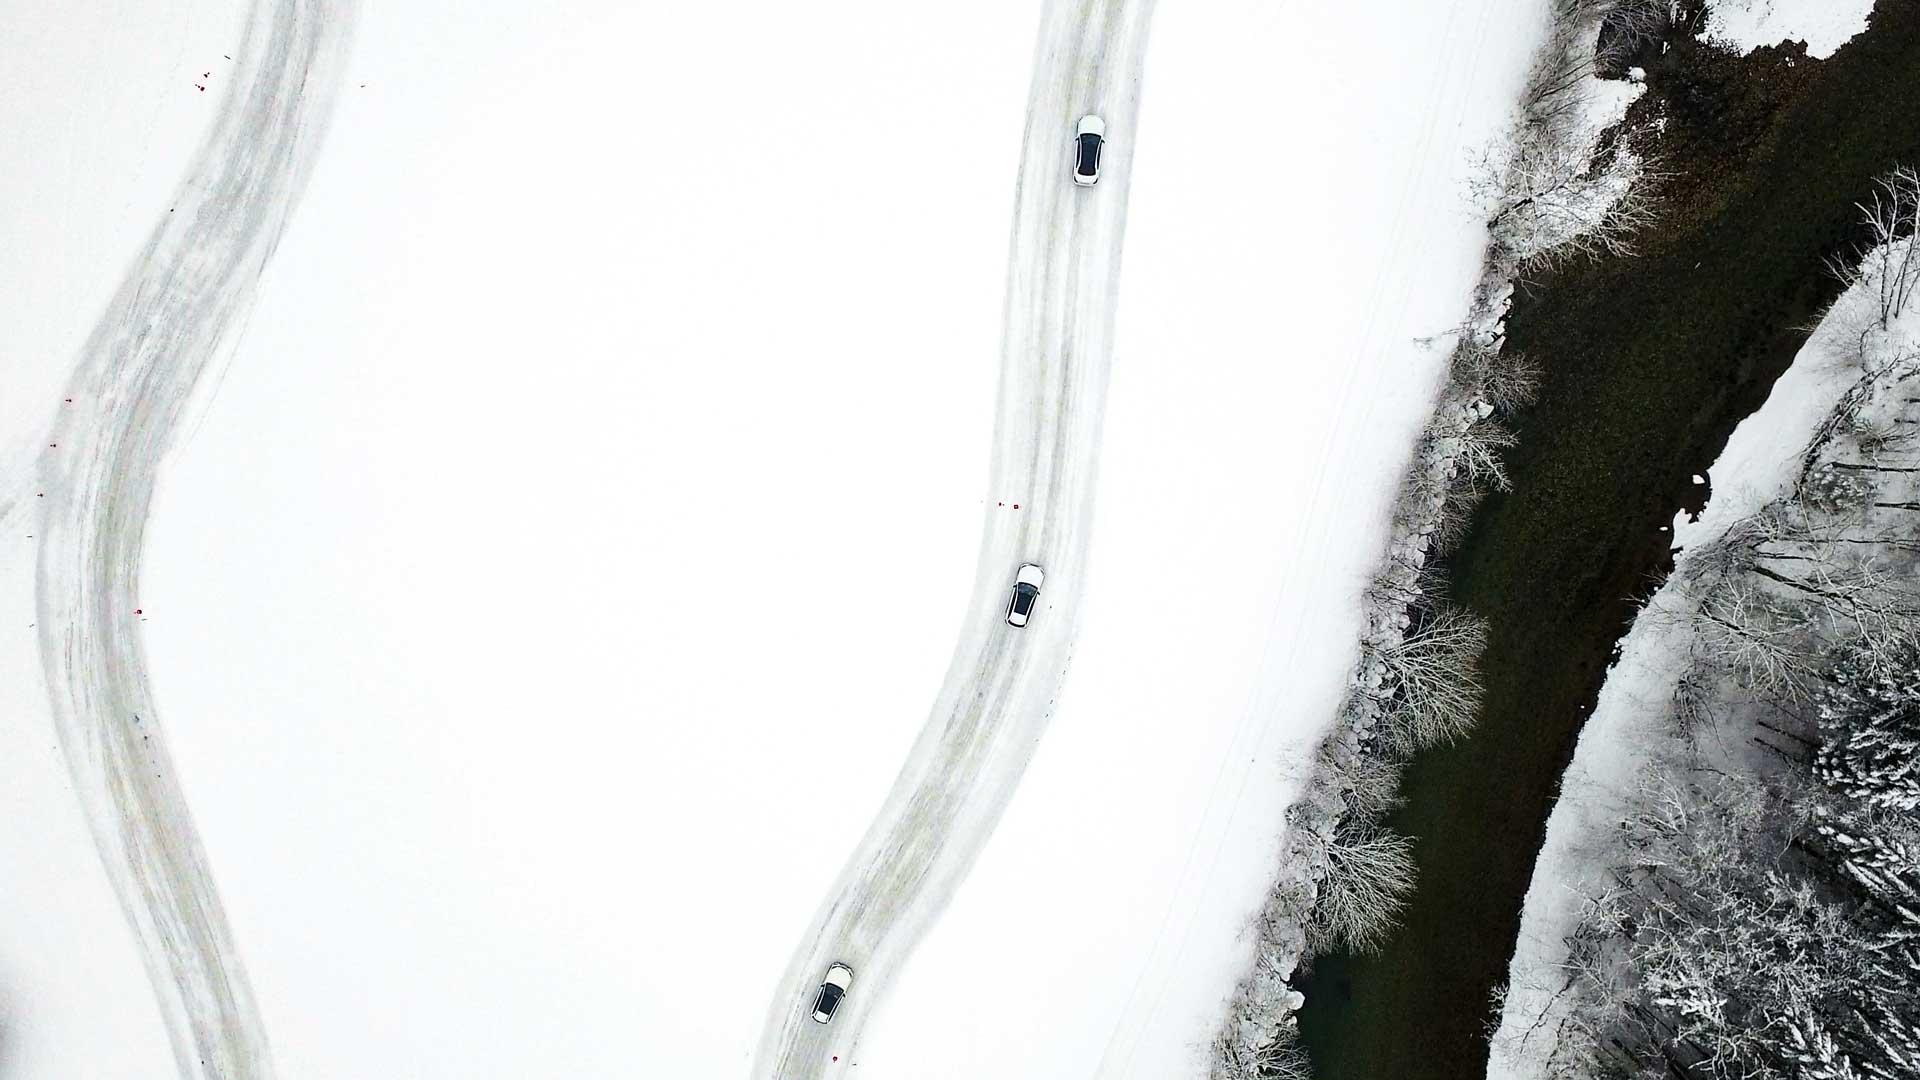 Saalfelden Austria FPV Drone - Mercedes Benz Driving Experience